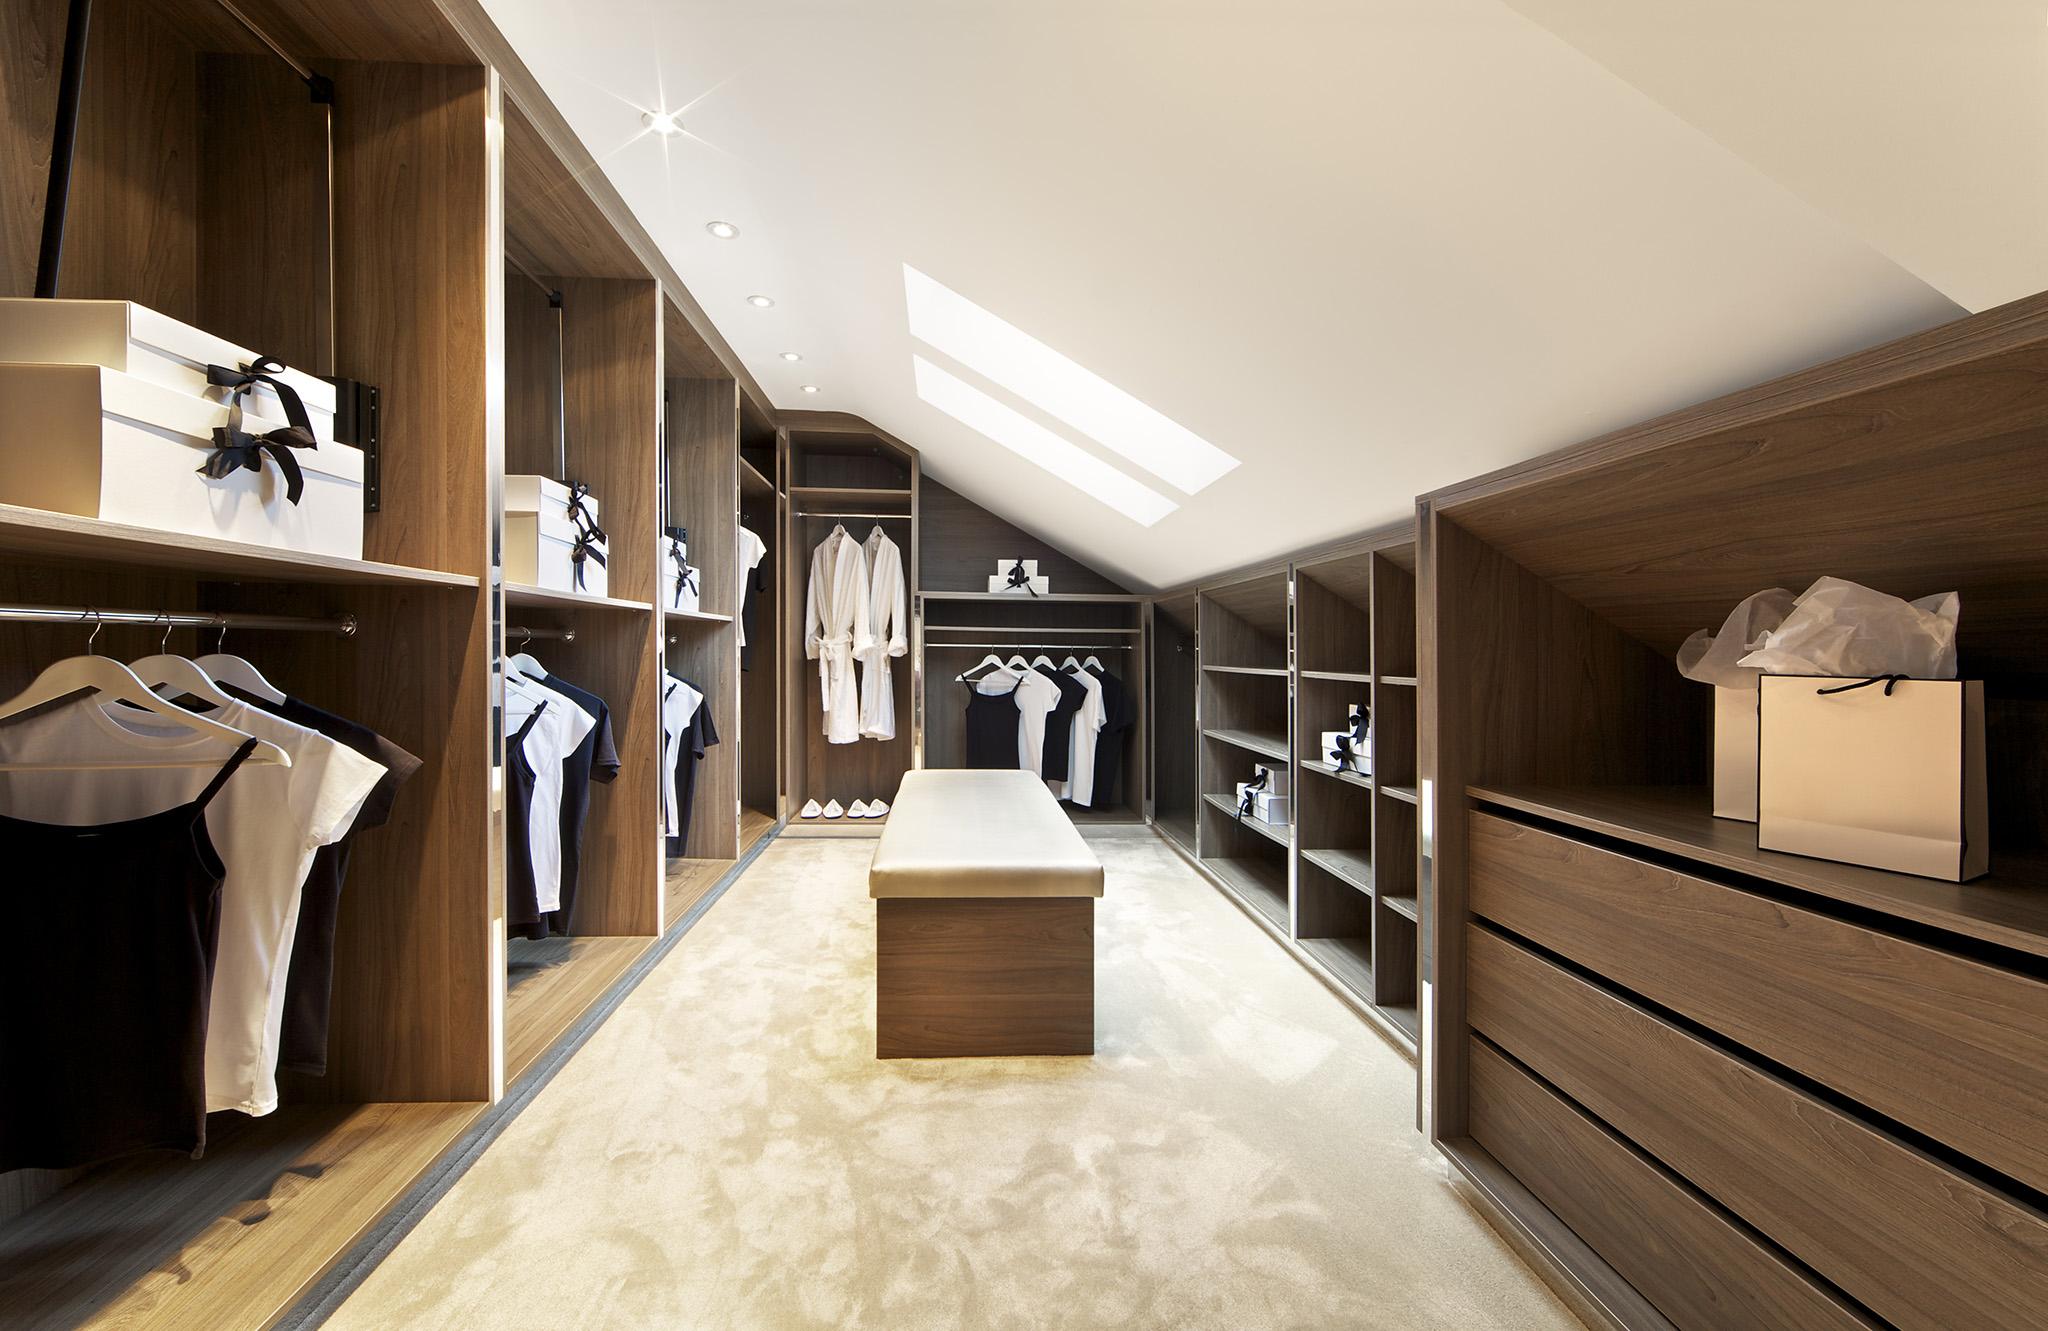 bespoke storage solutions, small bedroom furniture, wardrobe open storage